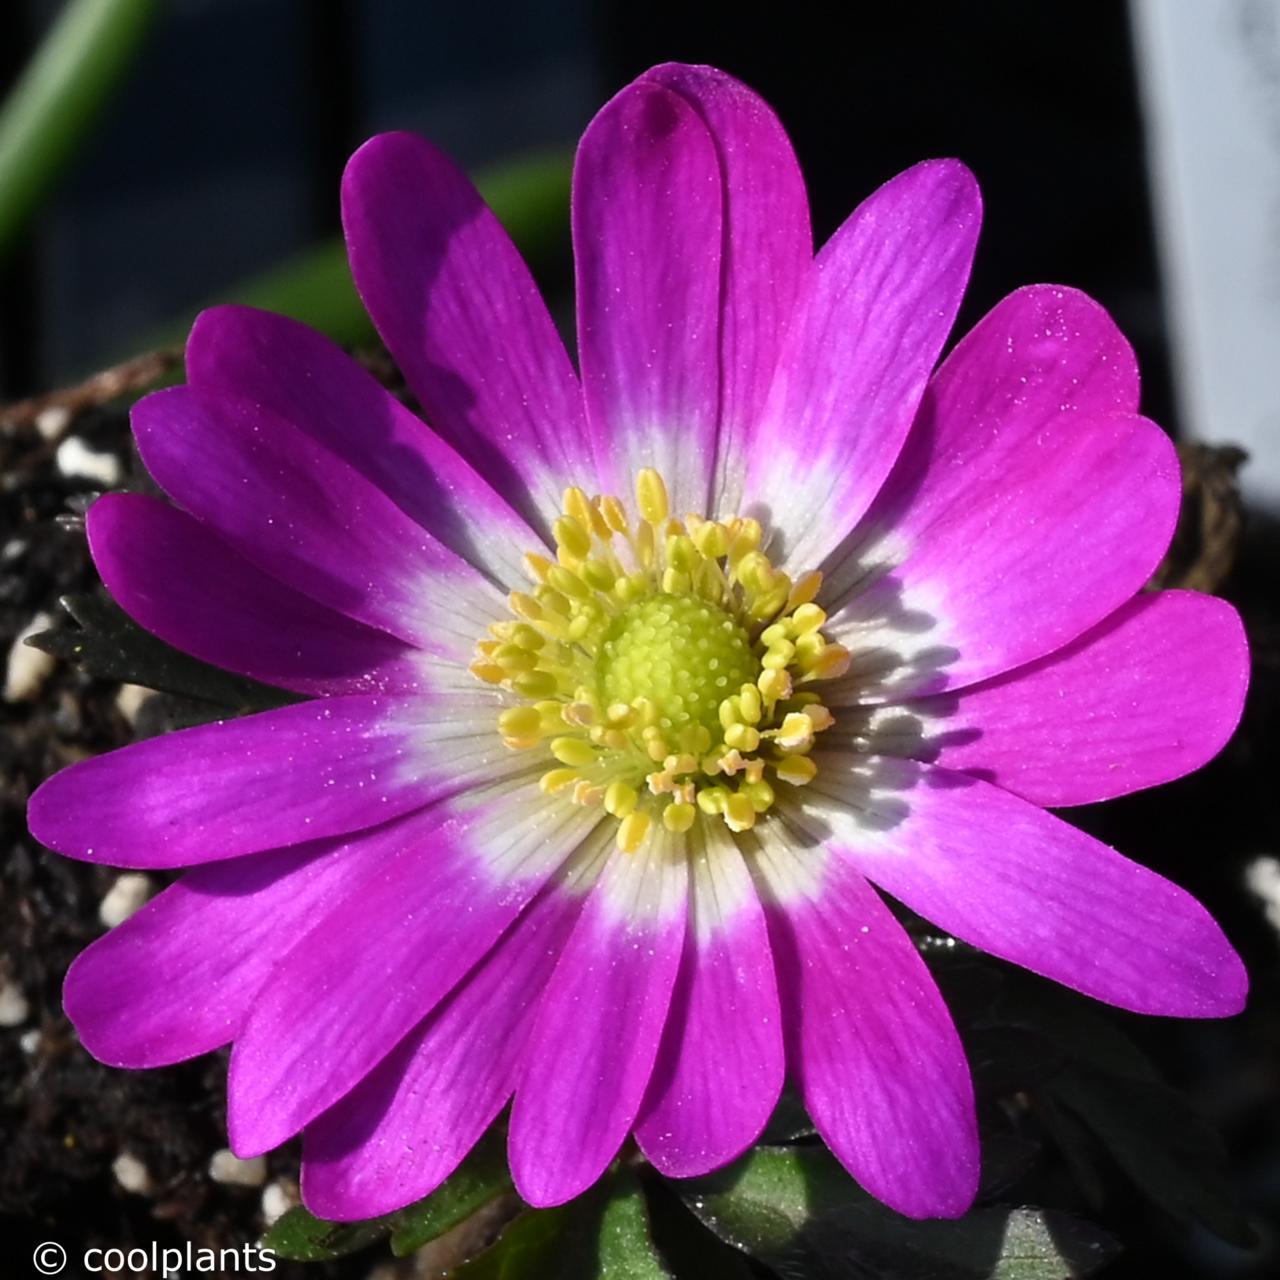 Anemone blanda 'Radar' plant